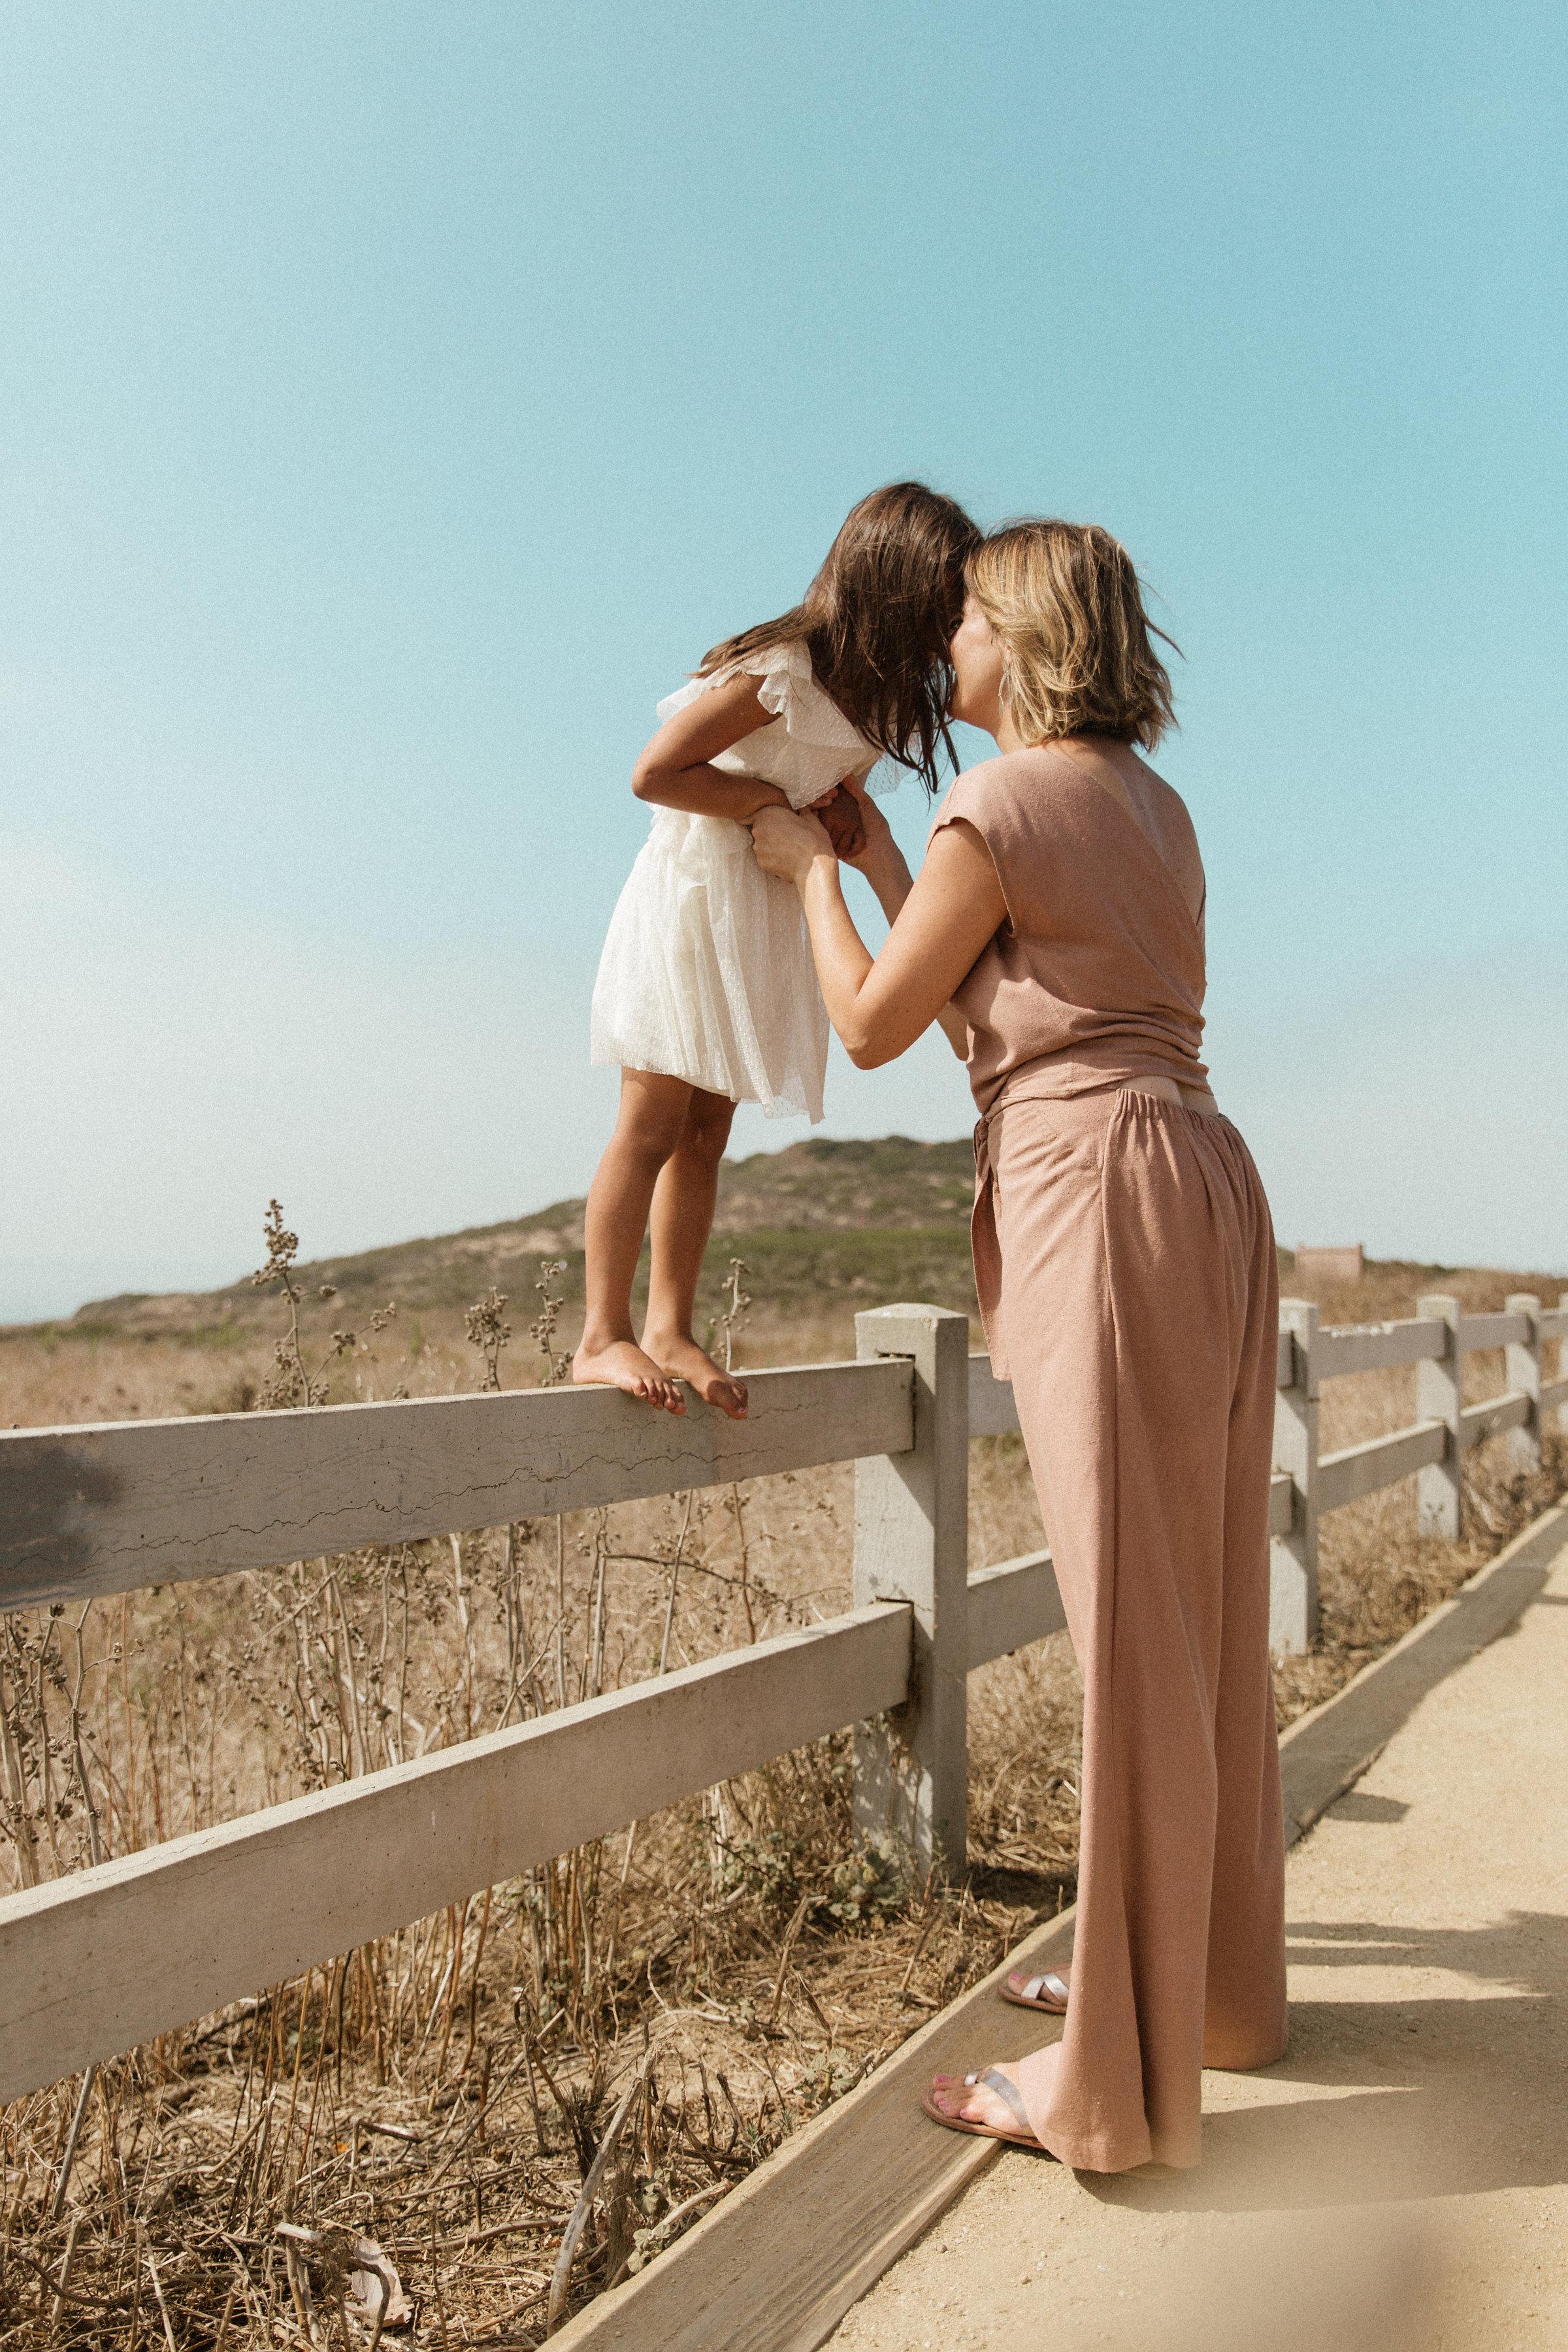 mercie-mother-daughter_nicki-sebastian-photography-78.jpg